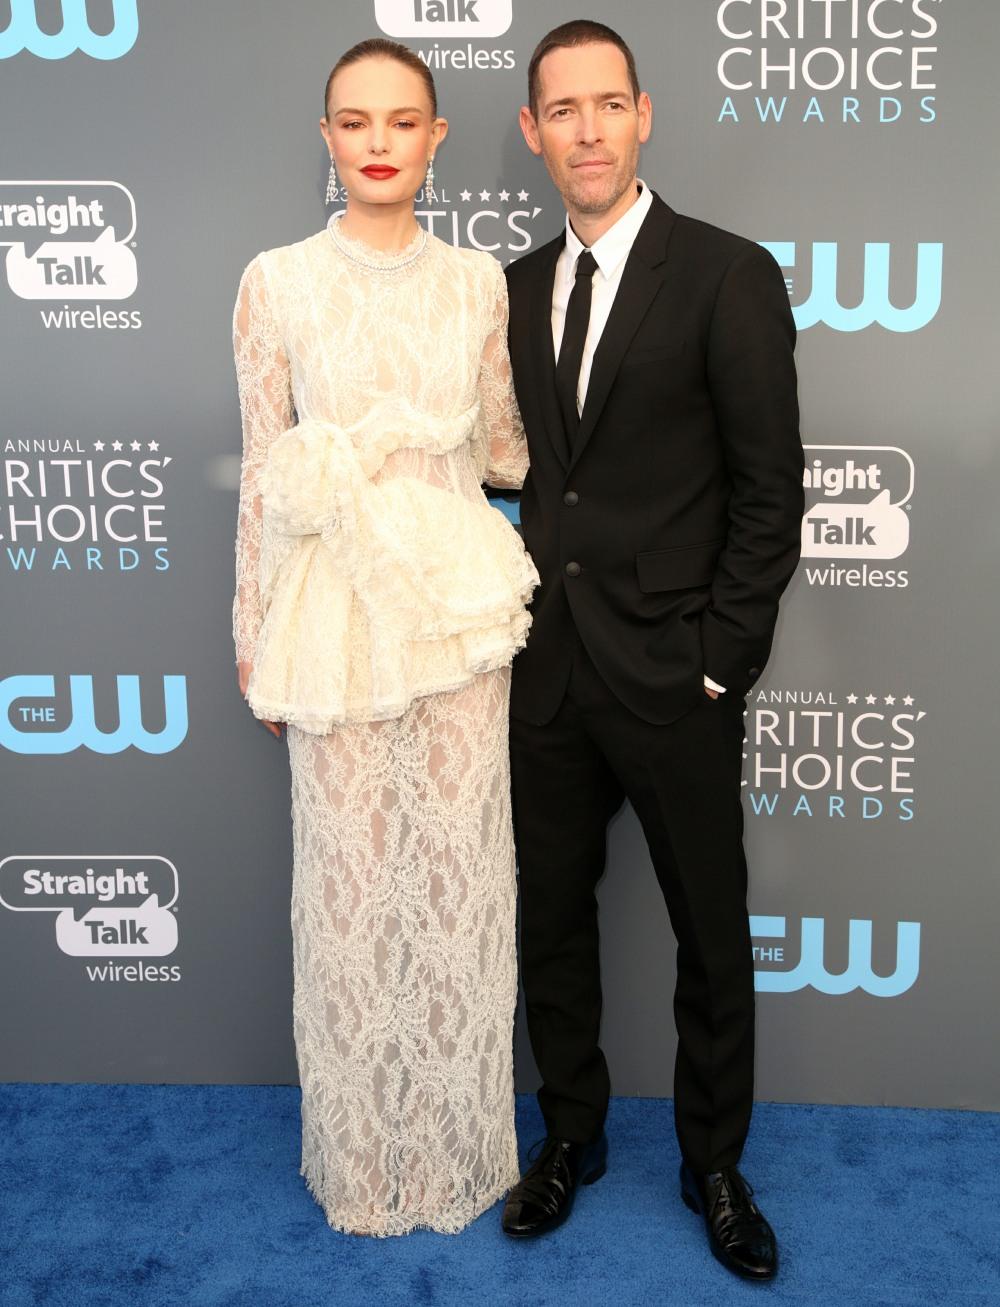 23rd Annual Critics' Choice Awards at Barker Hanger